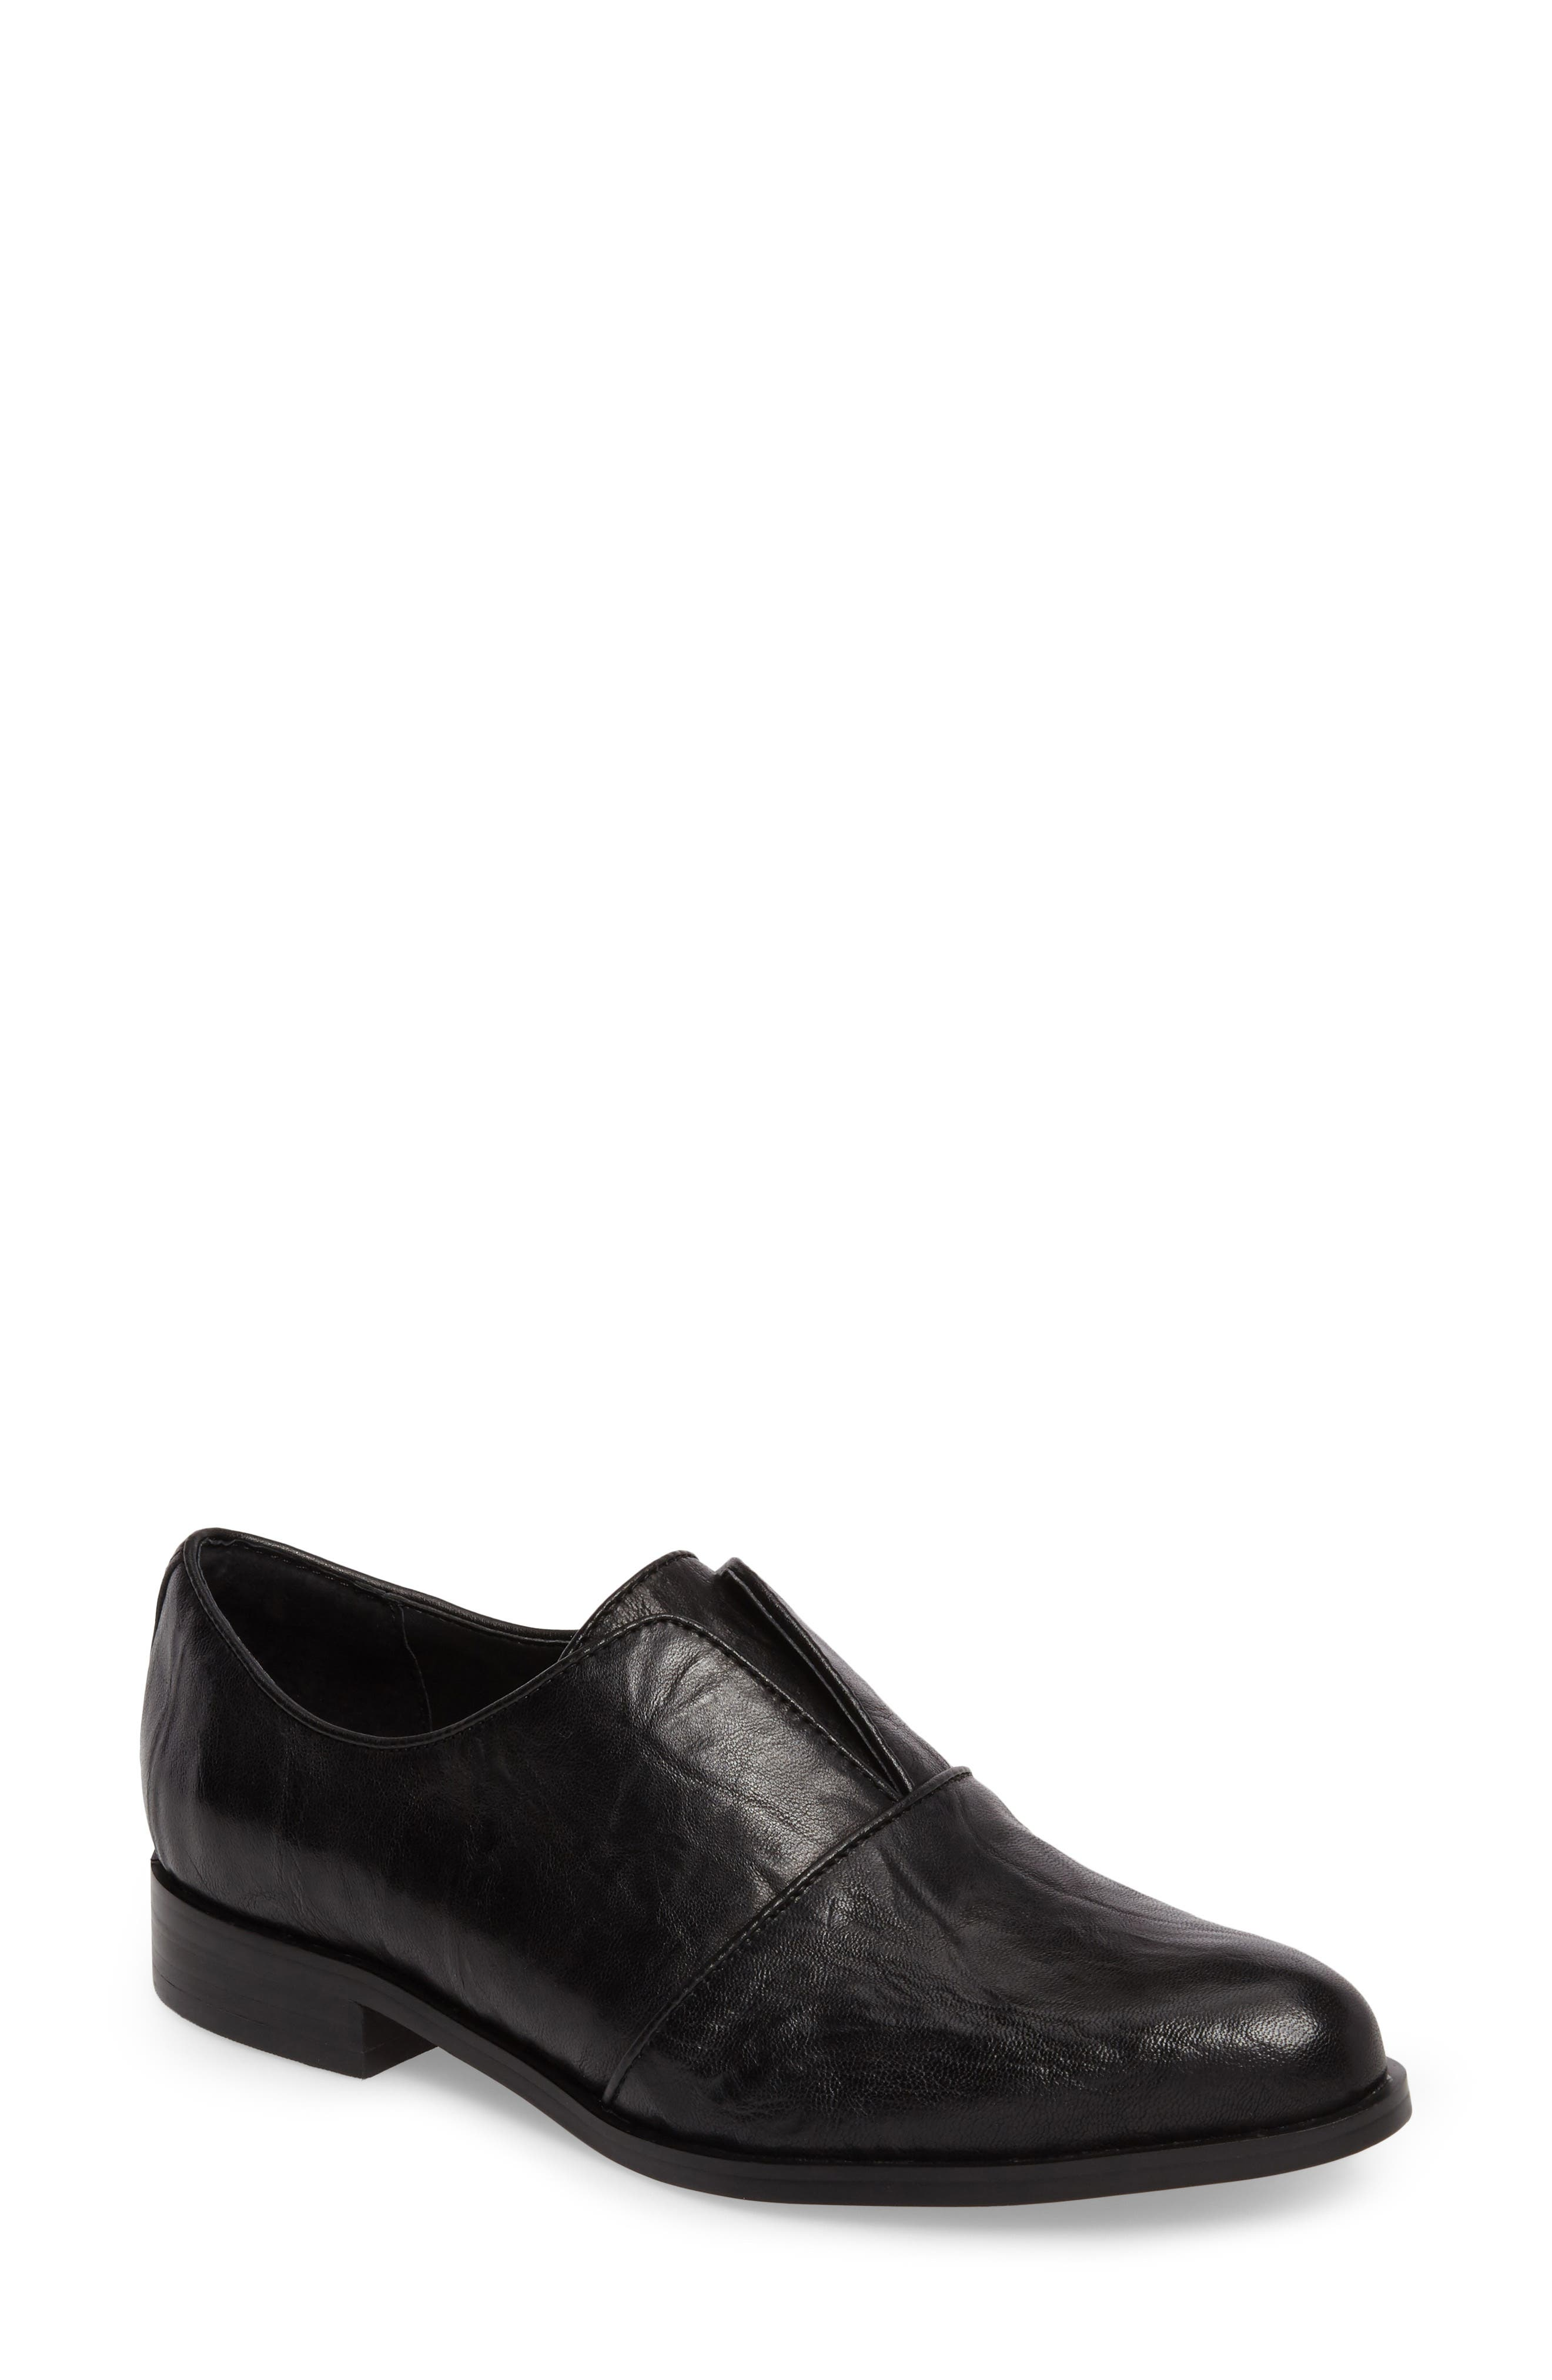 Isola Maria Slip-On Oxford,                         Main,                         color, Black Leather